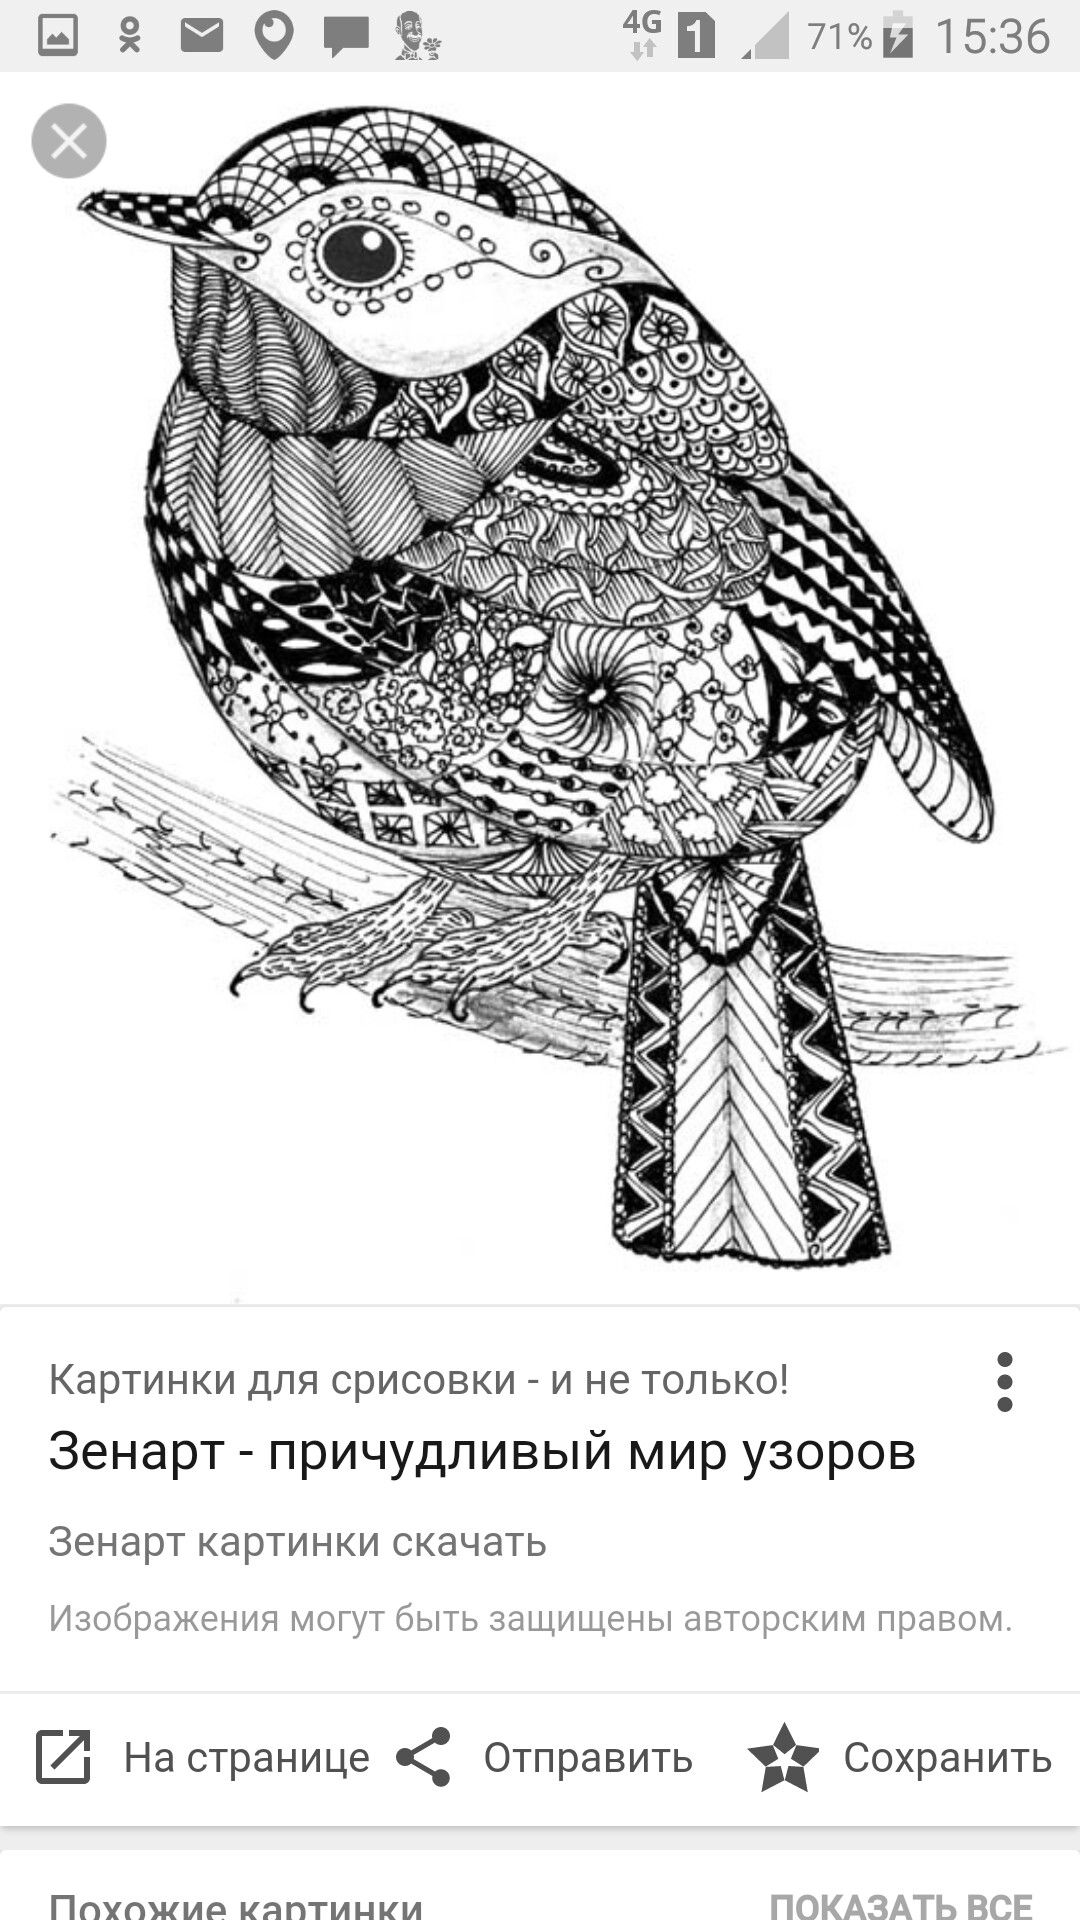 Pin by Екатерина Климова on Референс pinterest